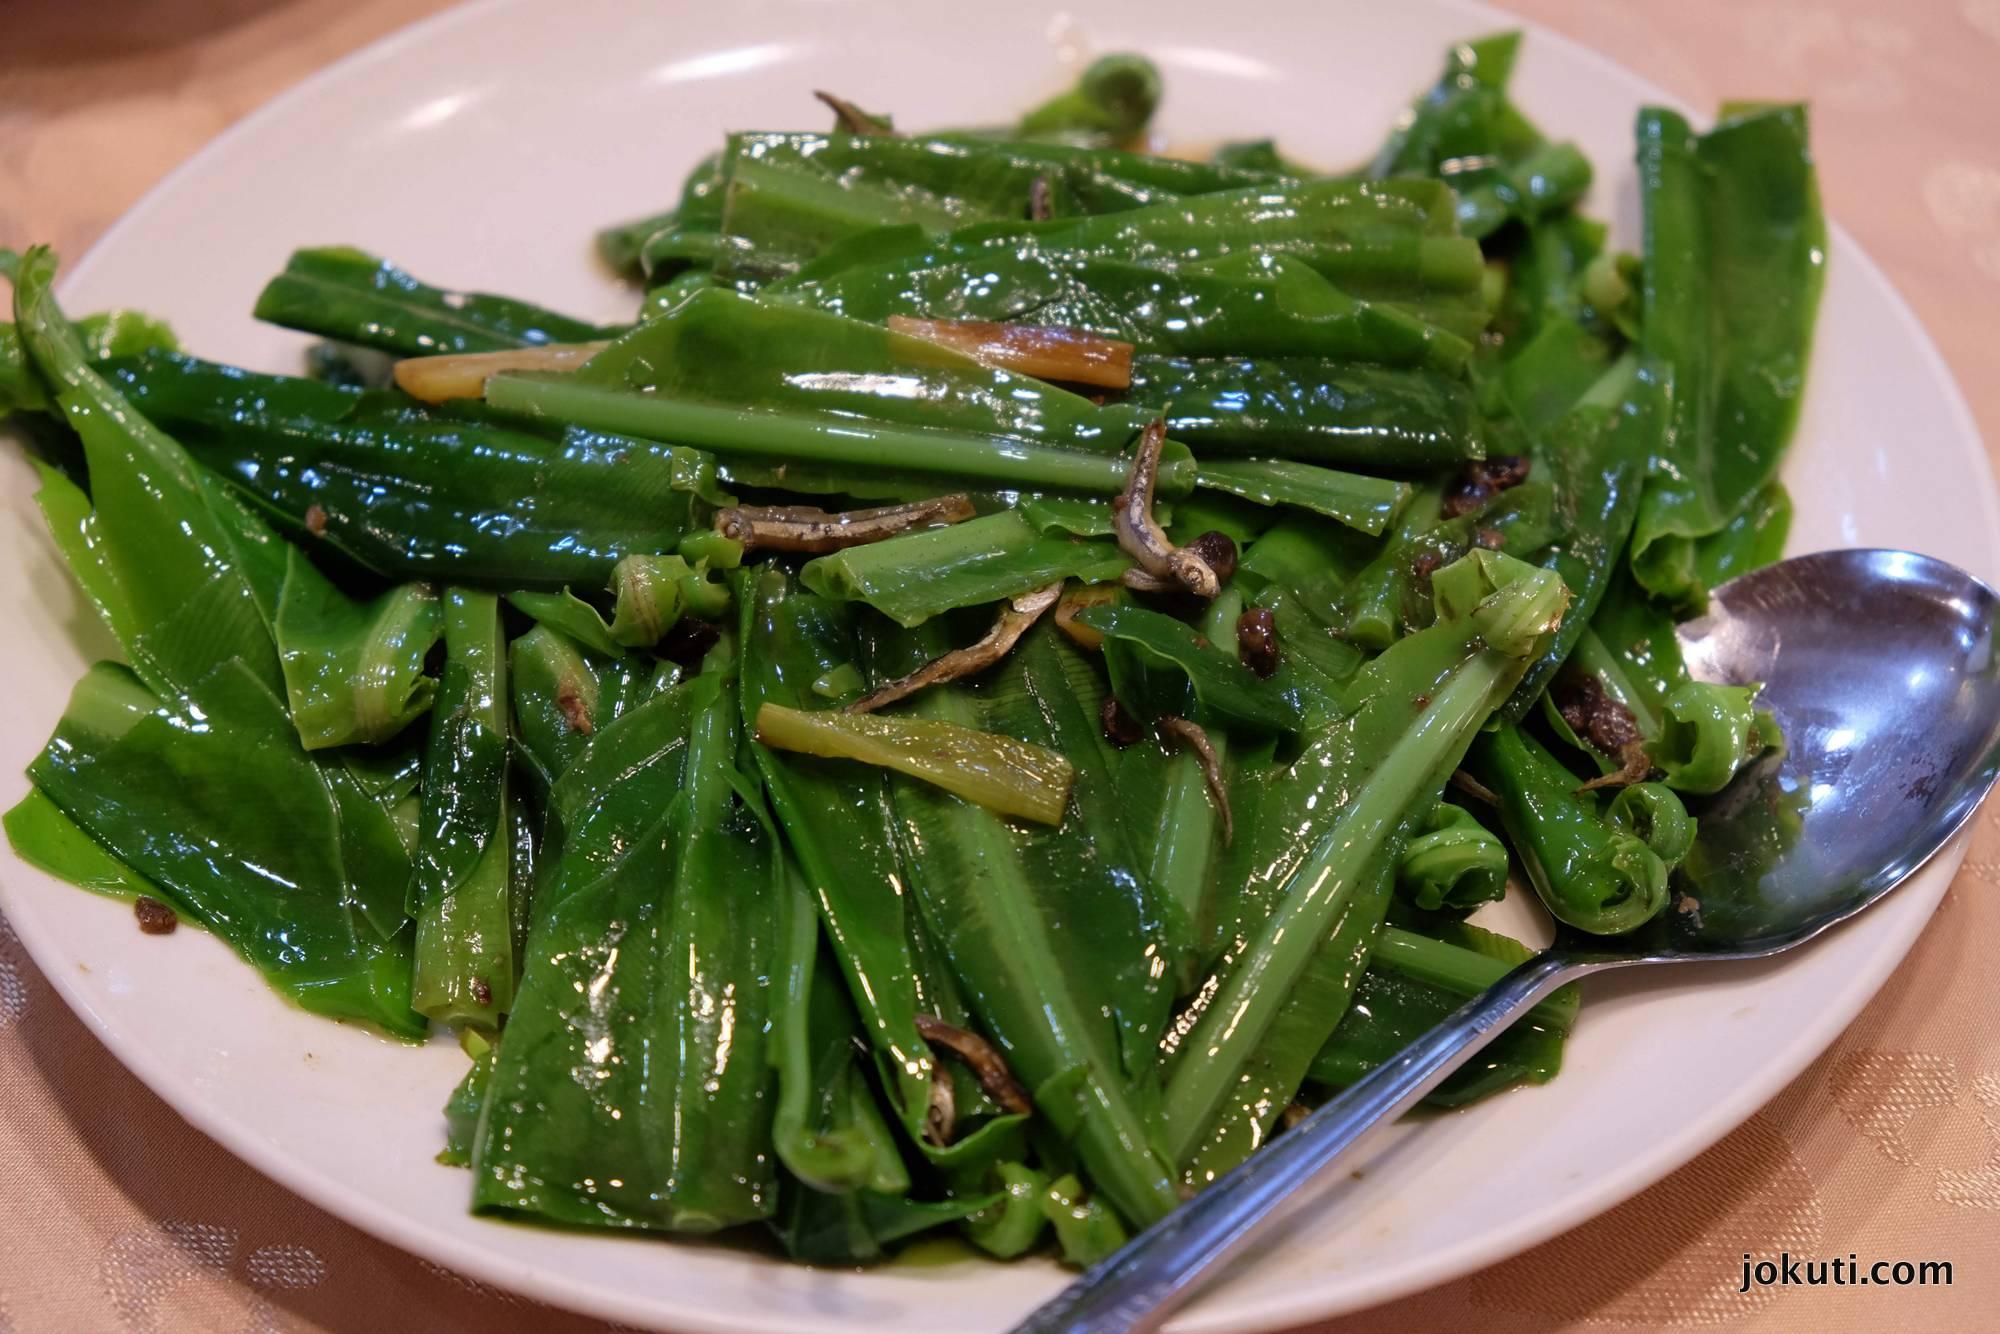 dscf2906_taipei_ming_fu_seafood_michelin_taiwan_vilagevo_jokuti.jpg